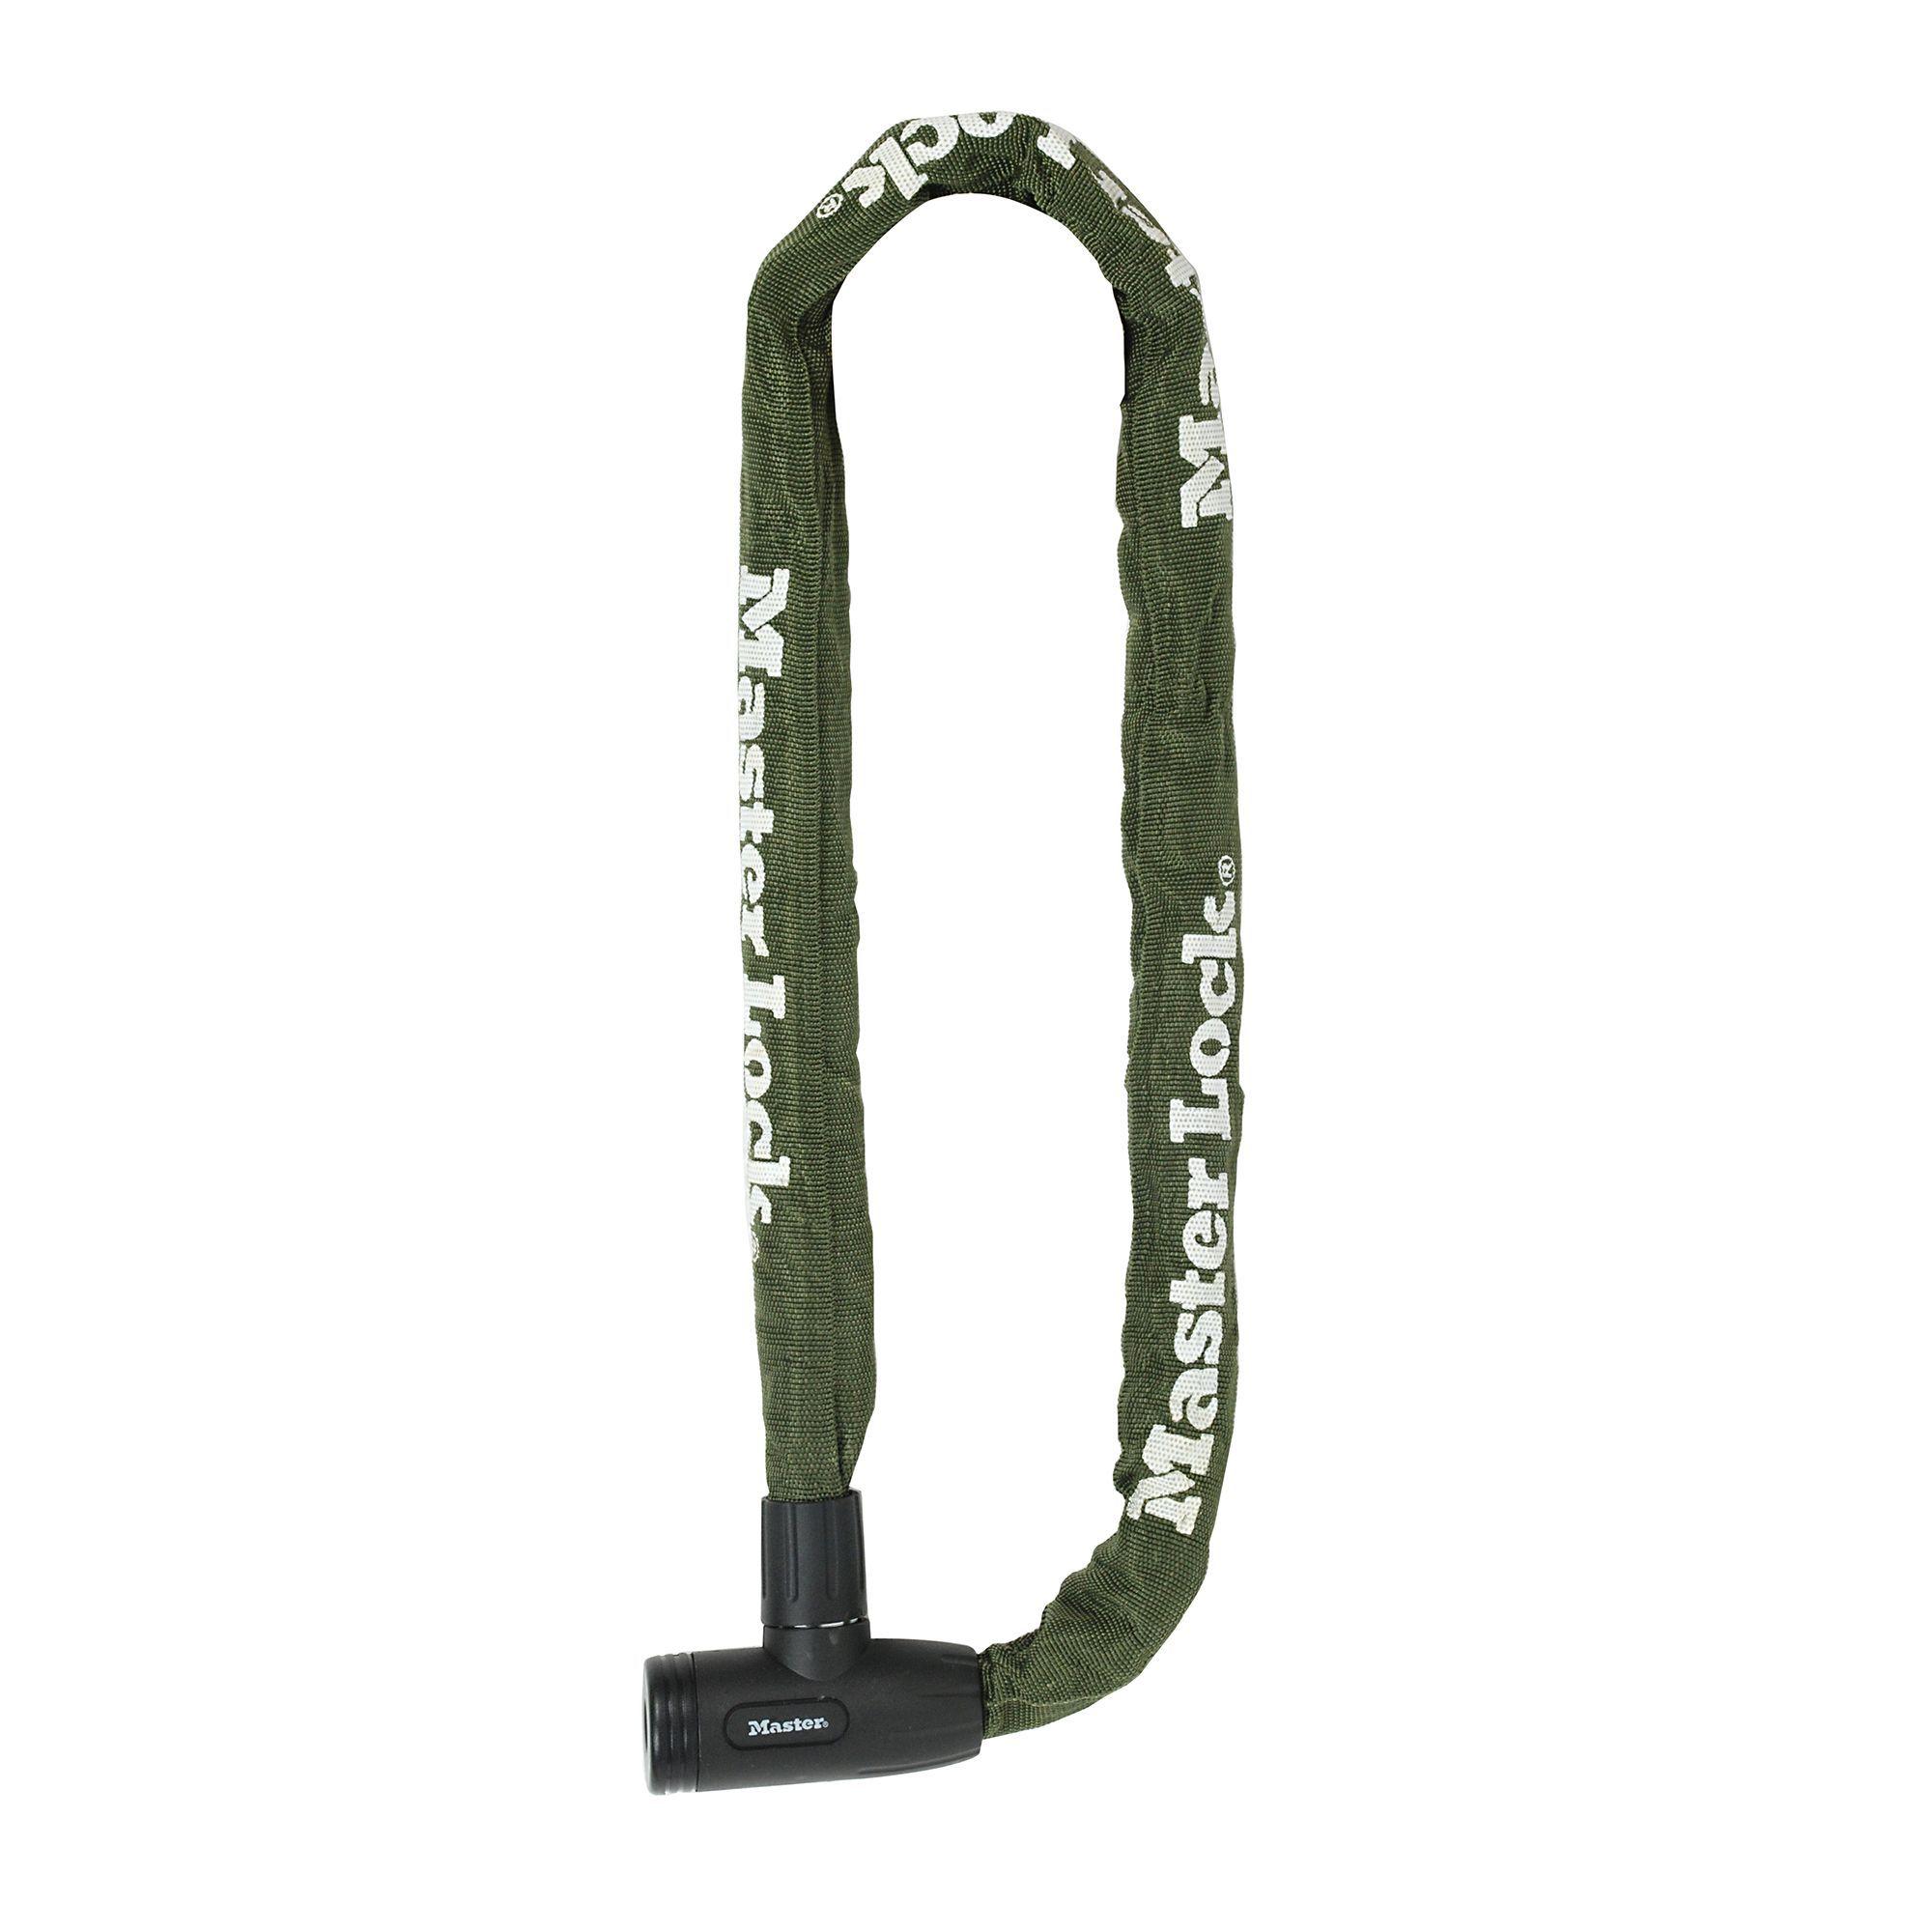 Master Lock Green Steel Chain lock 1m